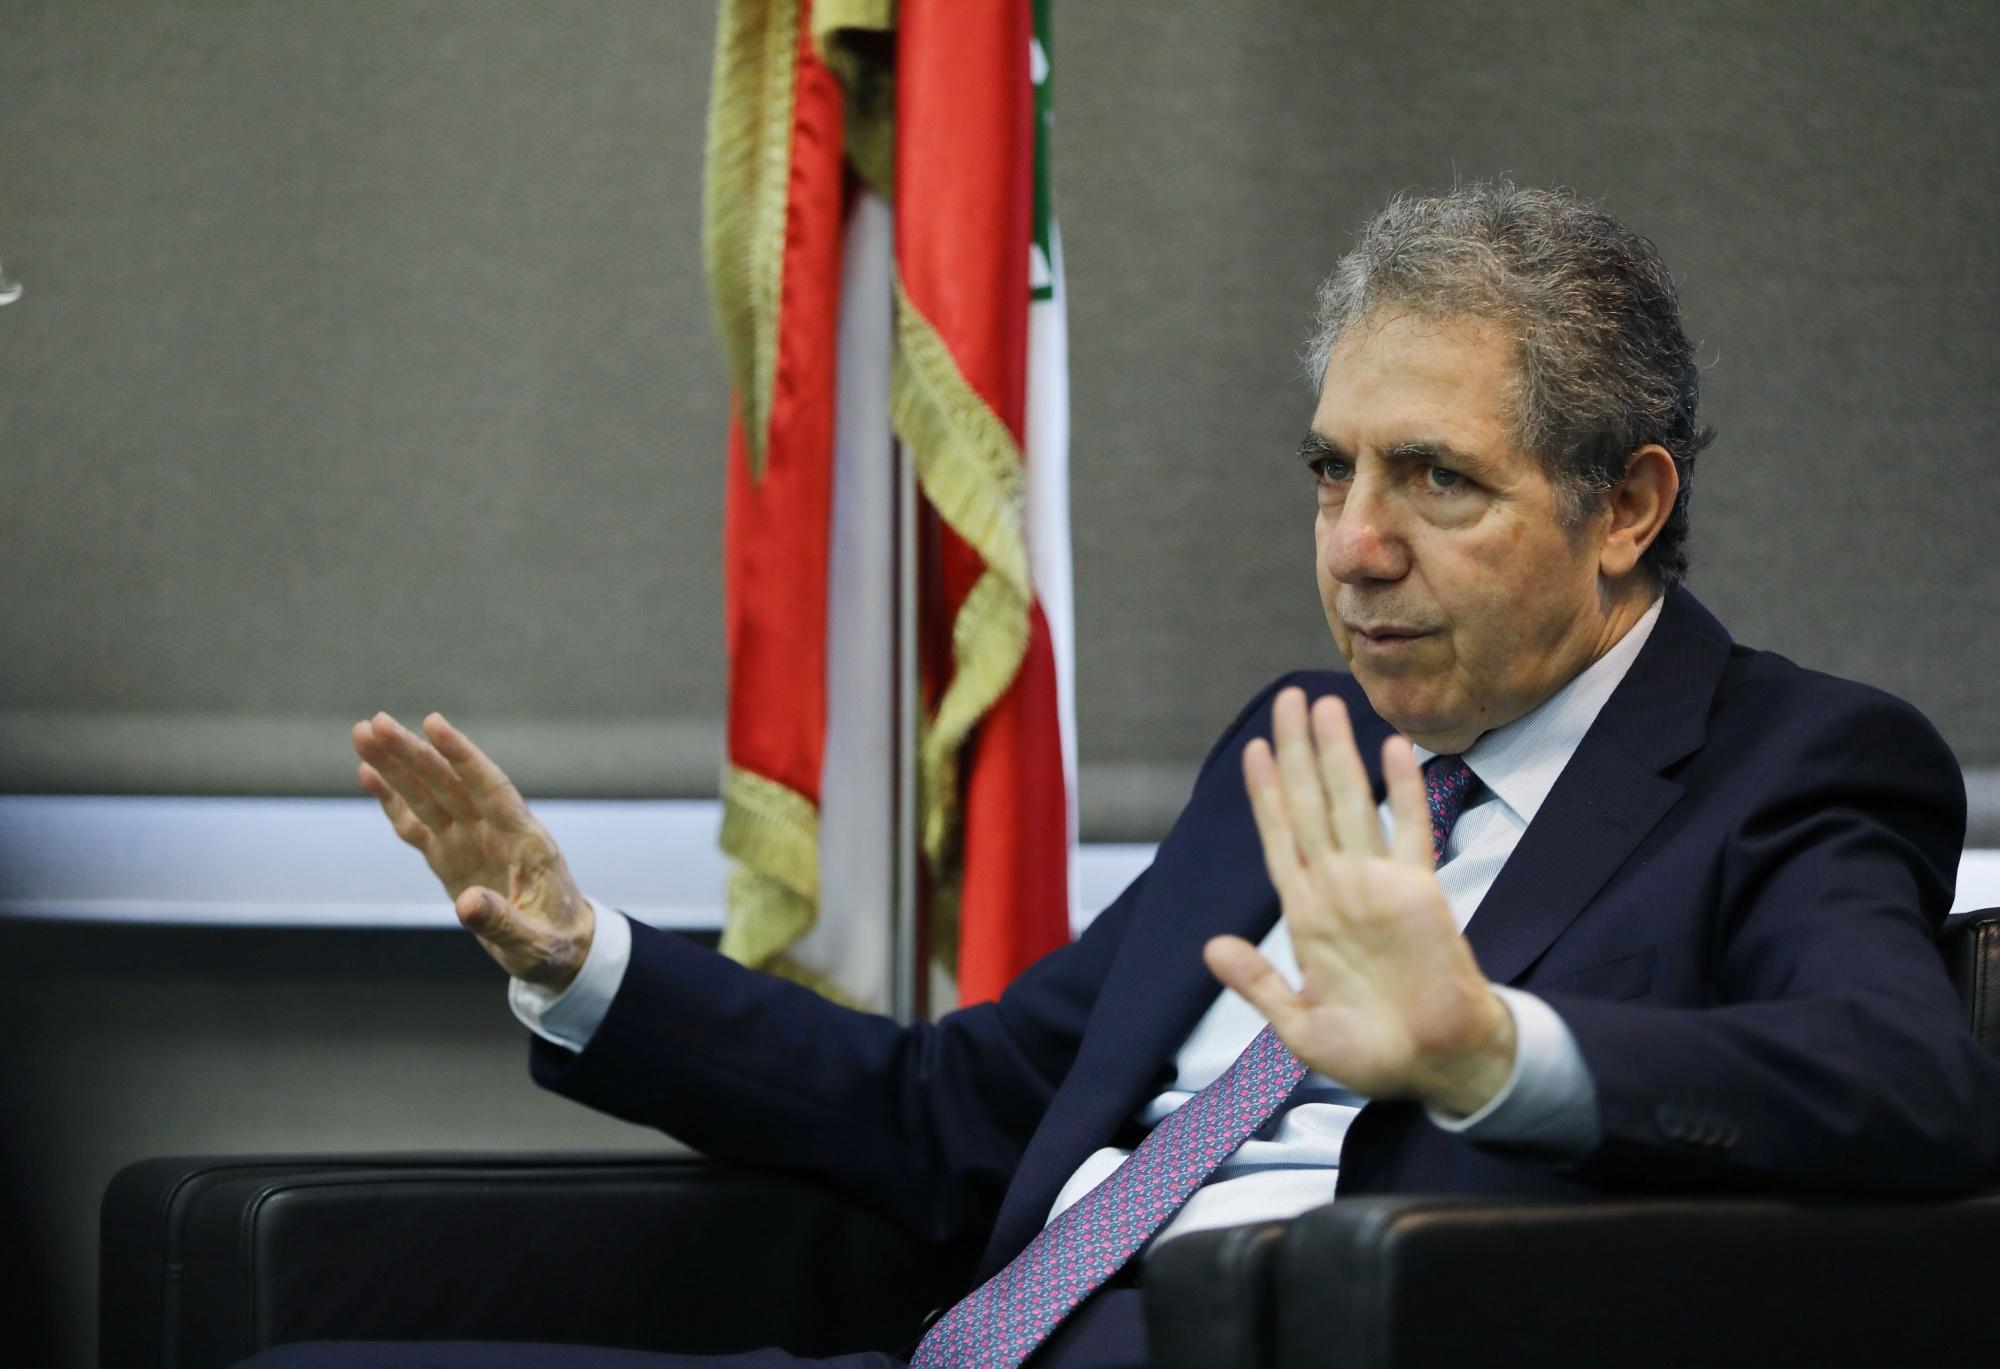 LEBANON-POLITICS-ECONOMY-WAZNI